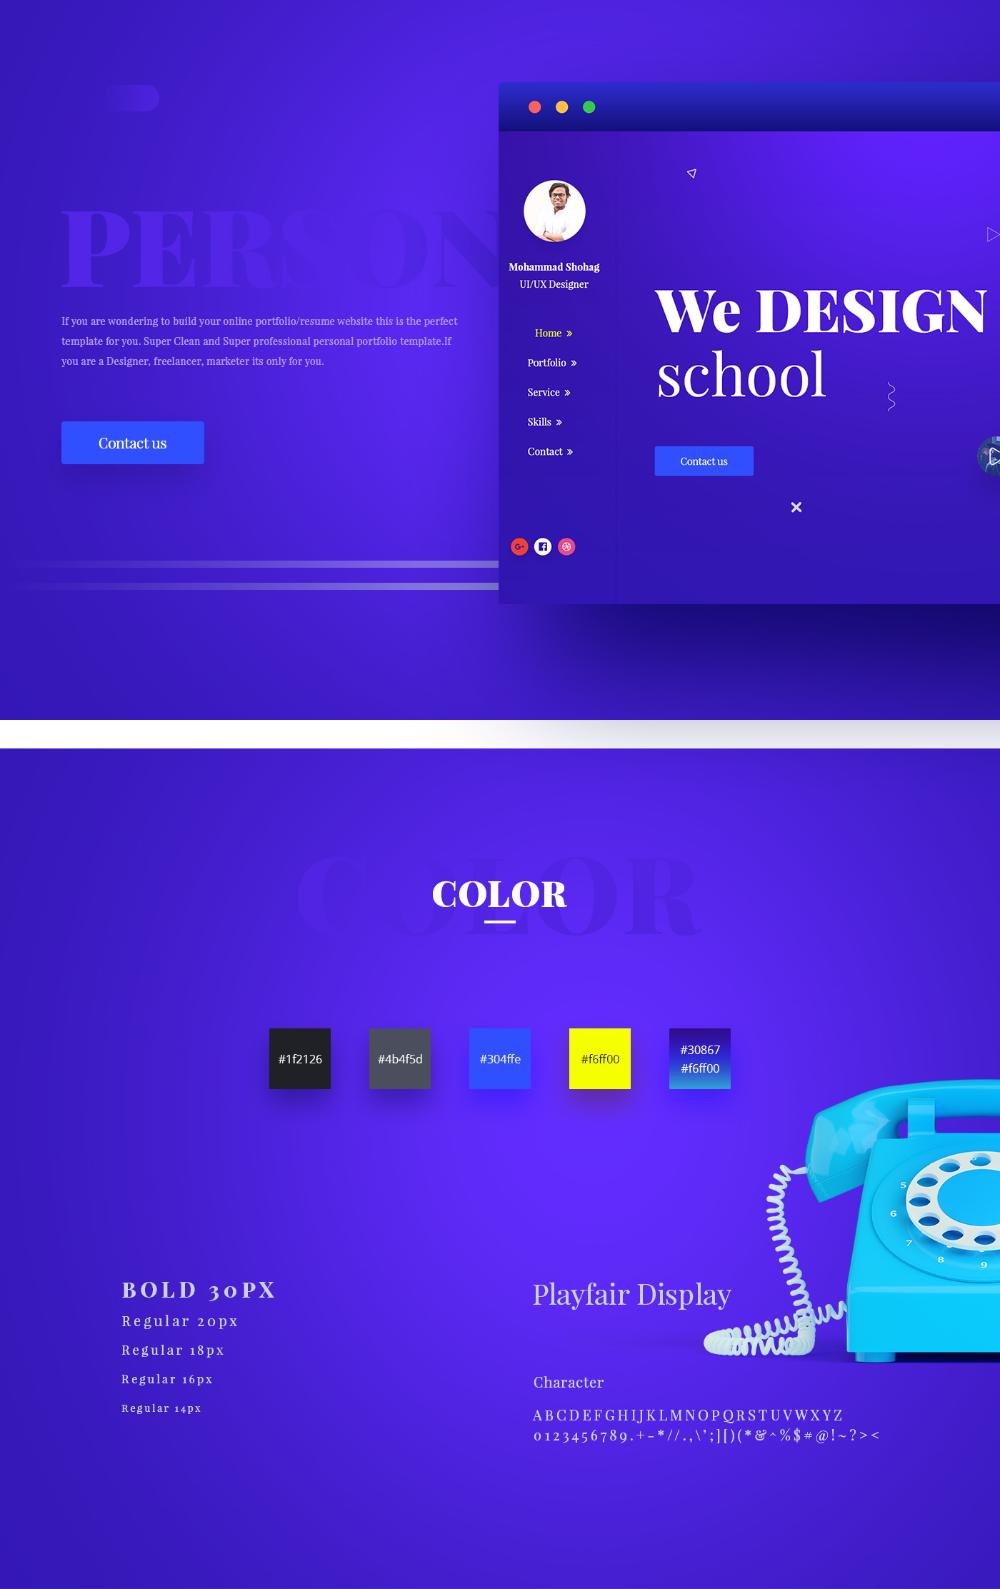 Portfolio Website Template PSD · Pinspiry in 2020